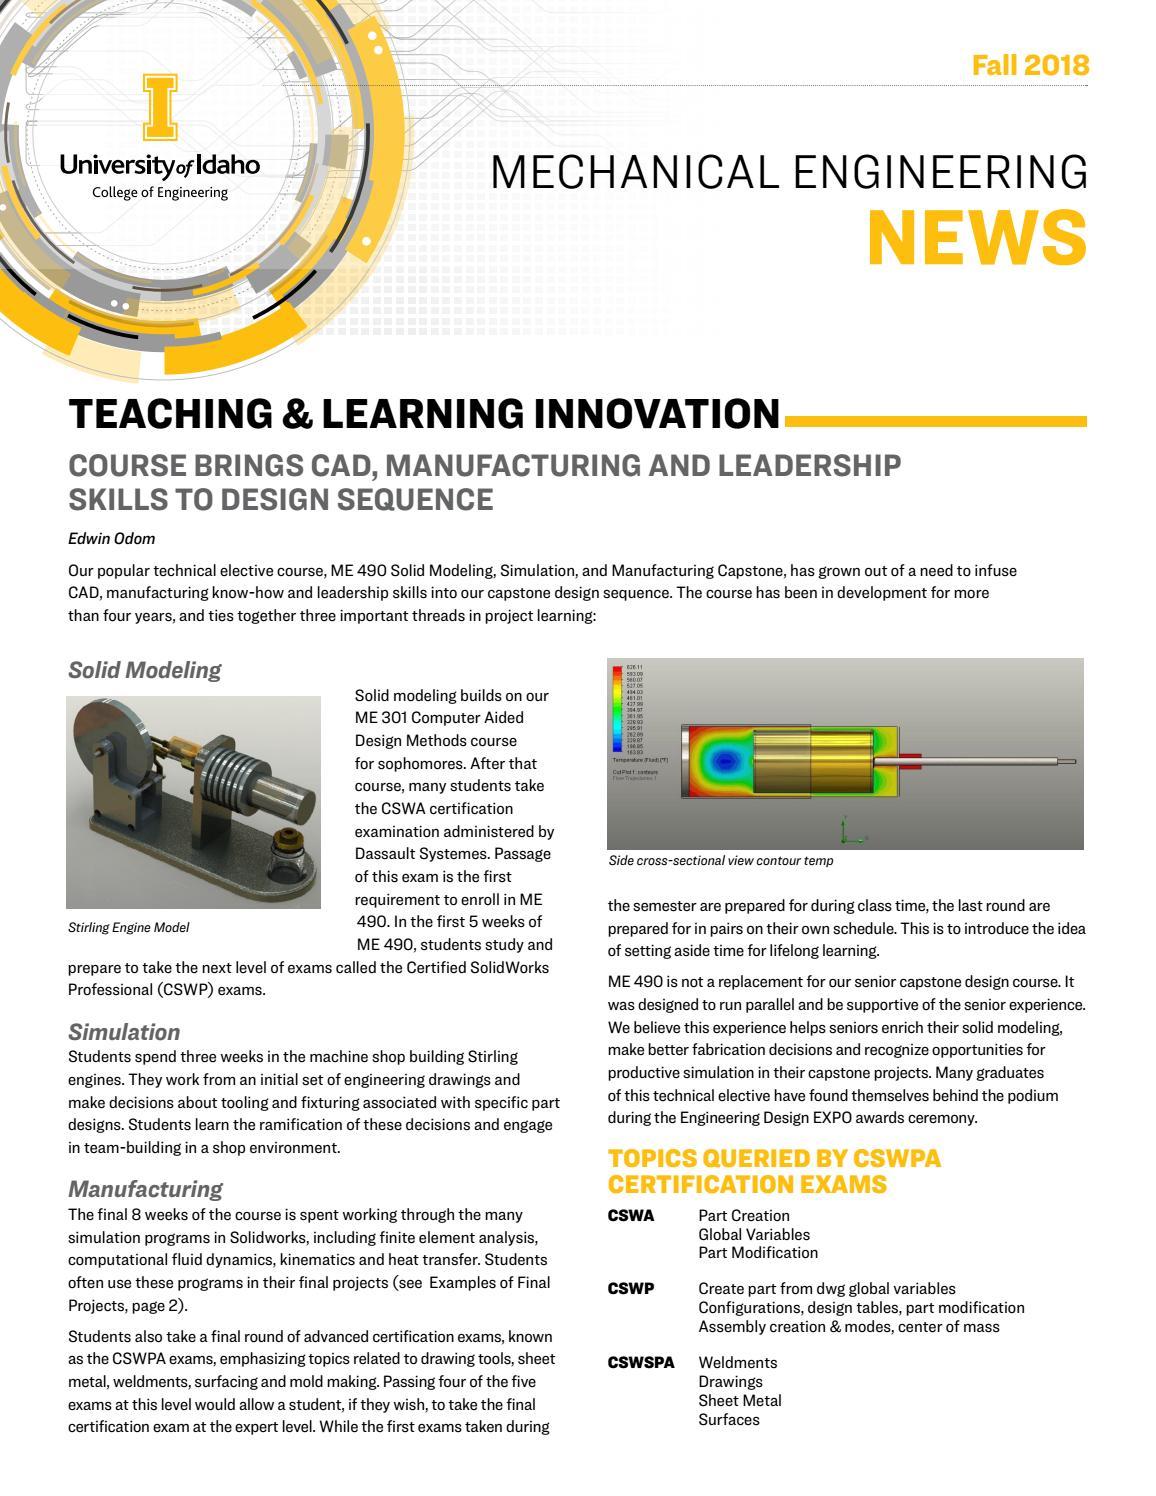 Mechanical Engineering News Fall 2018 By The University Of Idaho Issuu